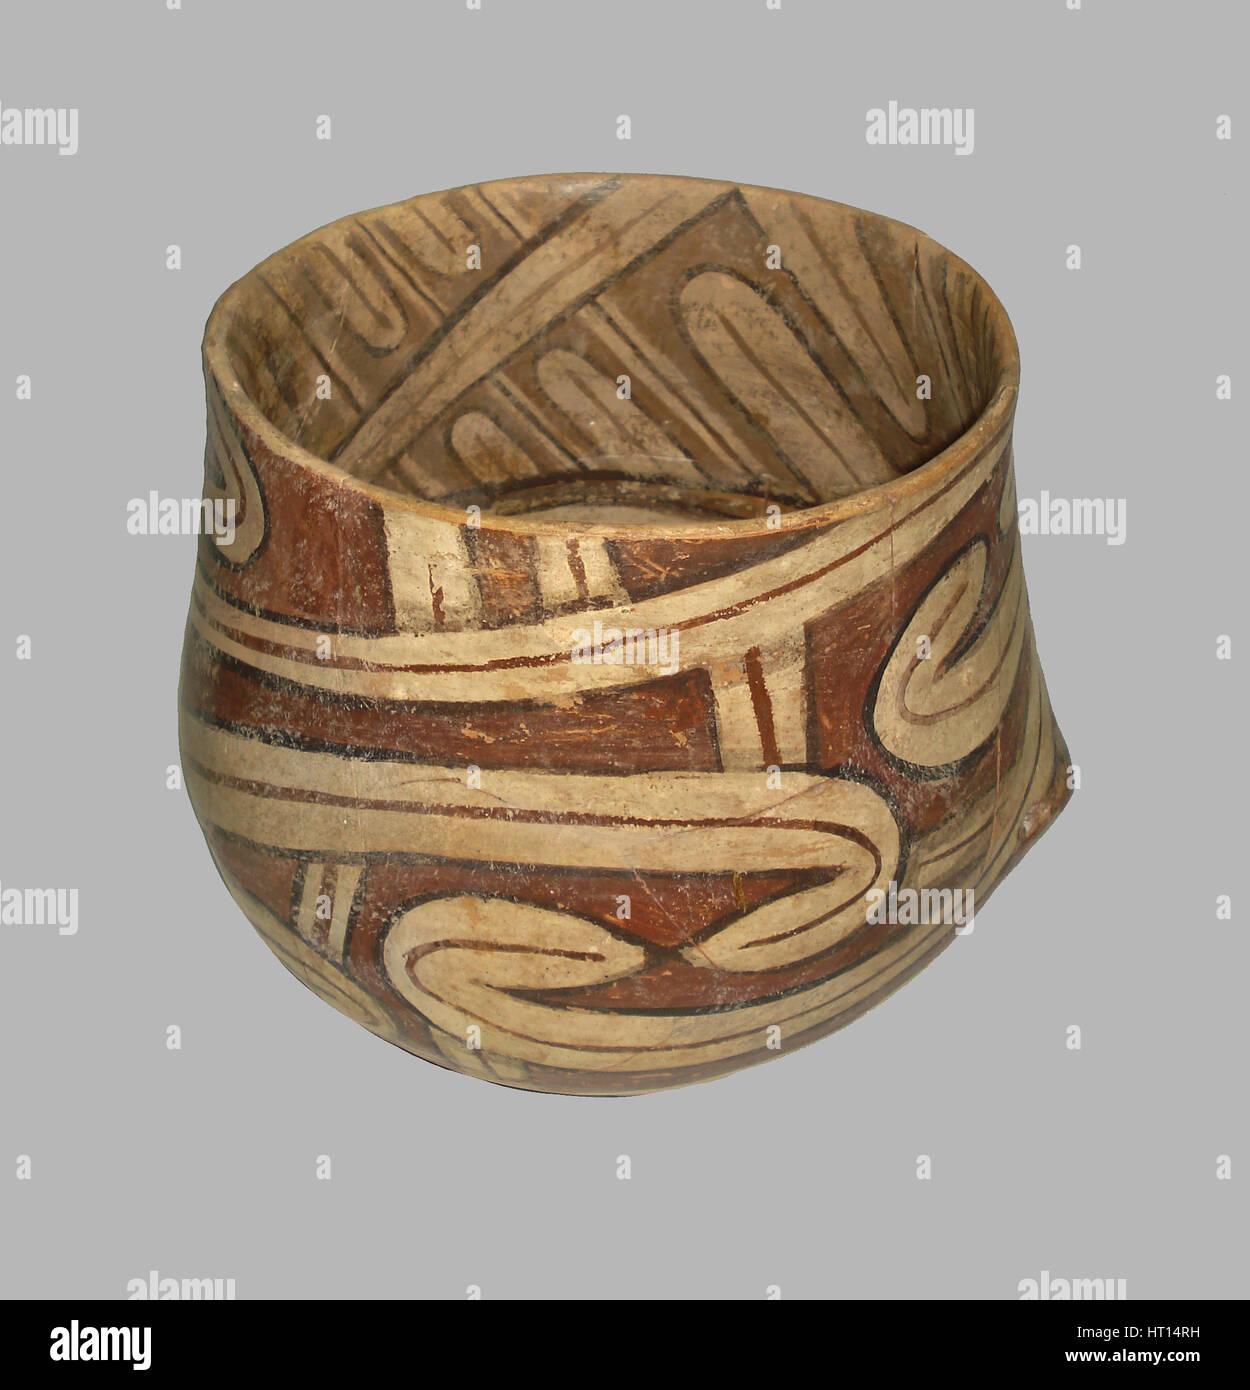 Vessel, 4100 BC. Artist: Prehistoric Russian Culture - Stock Image